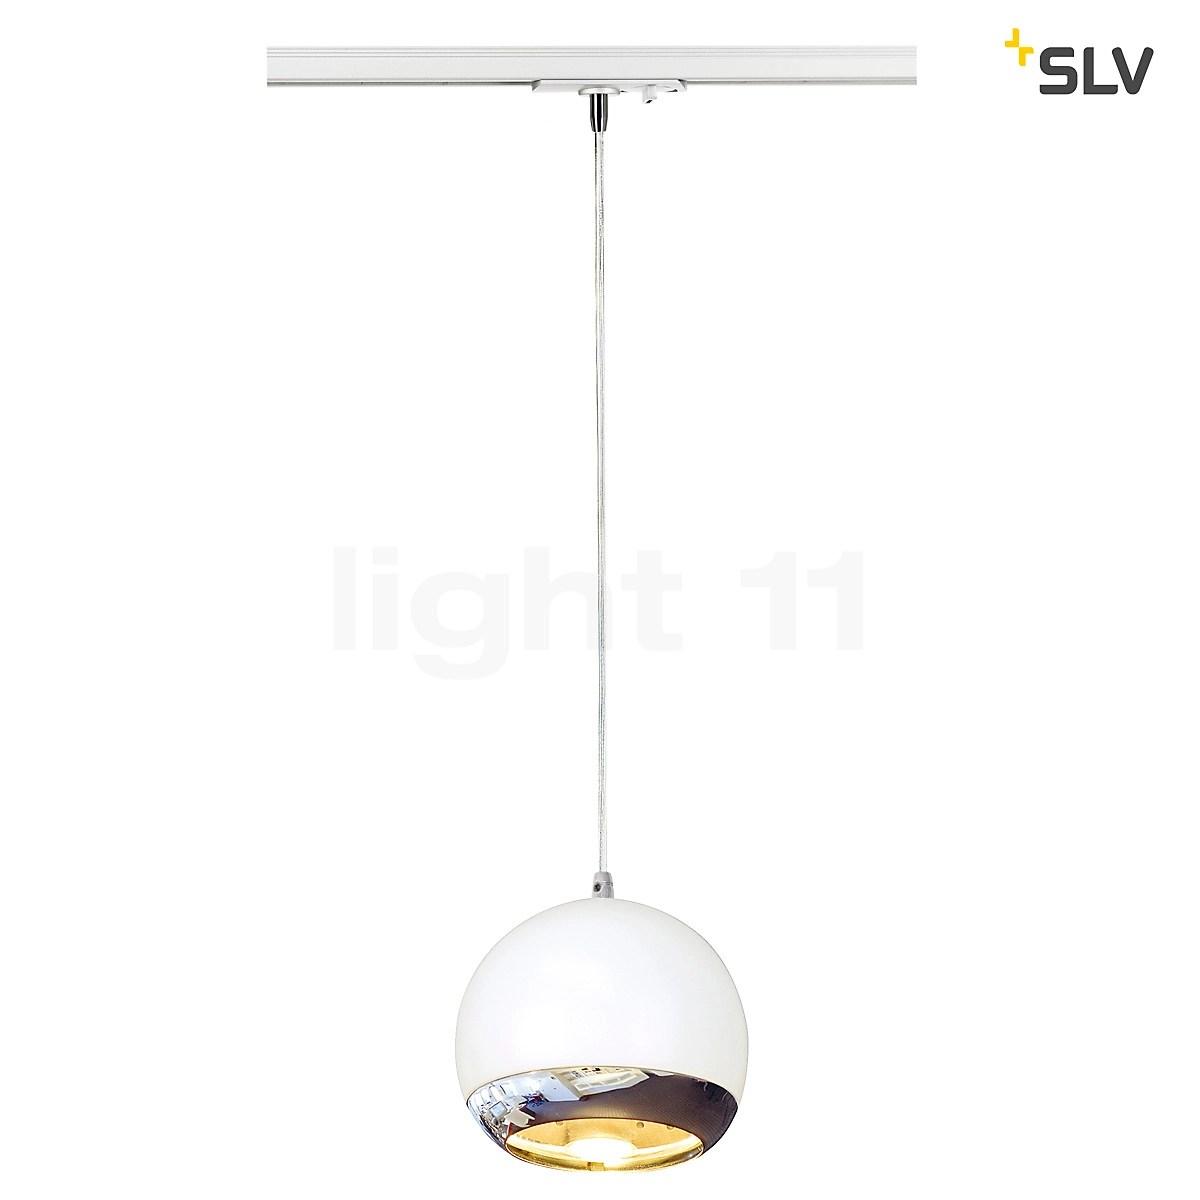 slv light eye pendant light for high voltage monorail systems